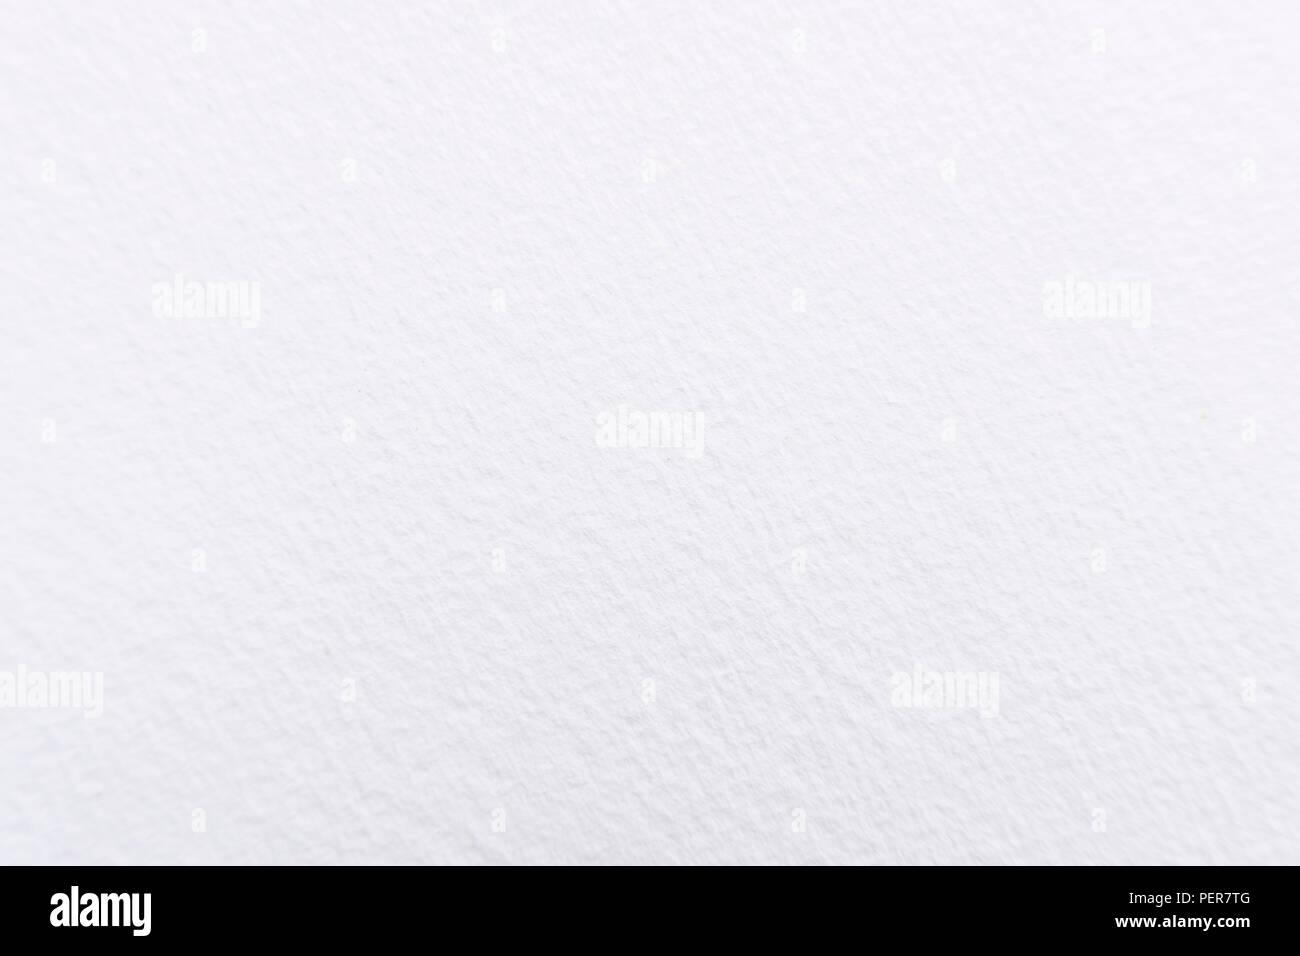 Cardboard texture desktop background Stock Photo